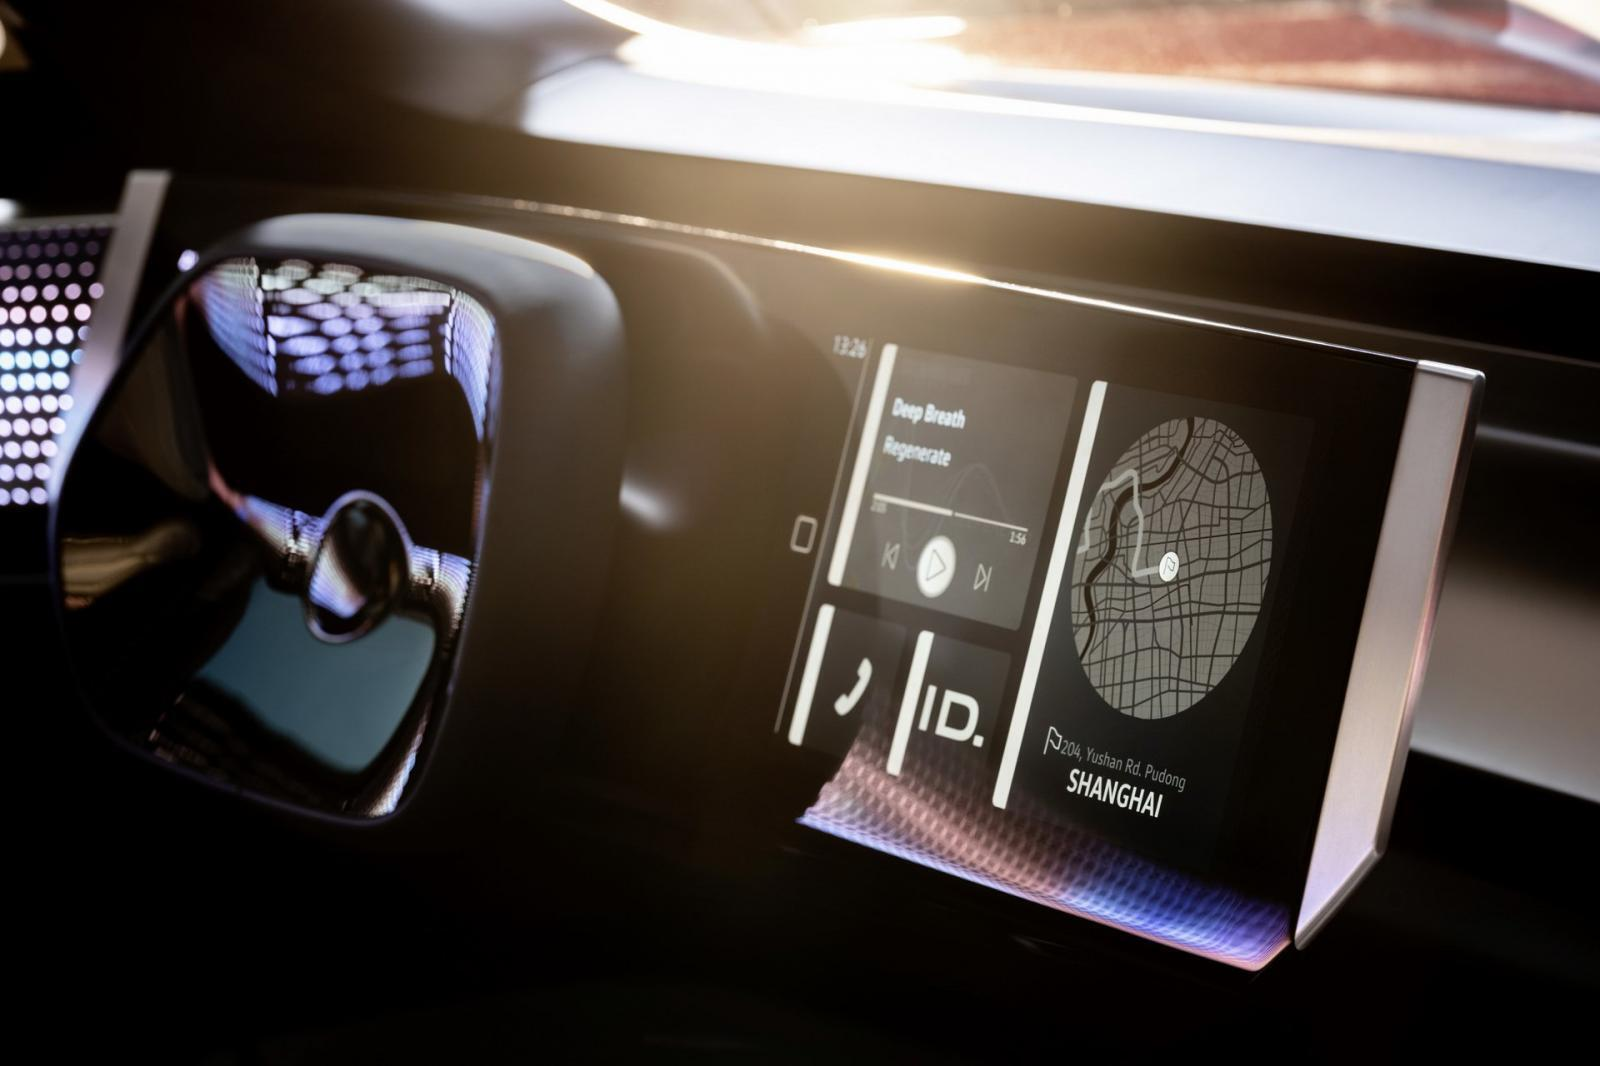 volkswagen-id-roomzz-concept-suv-dien-co-cu-li-di-chuyen-450-km-va-lap-dat-3-hang-ghe-duoc-ra-mat-5.jpg